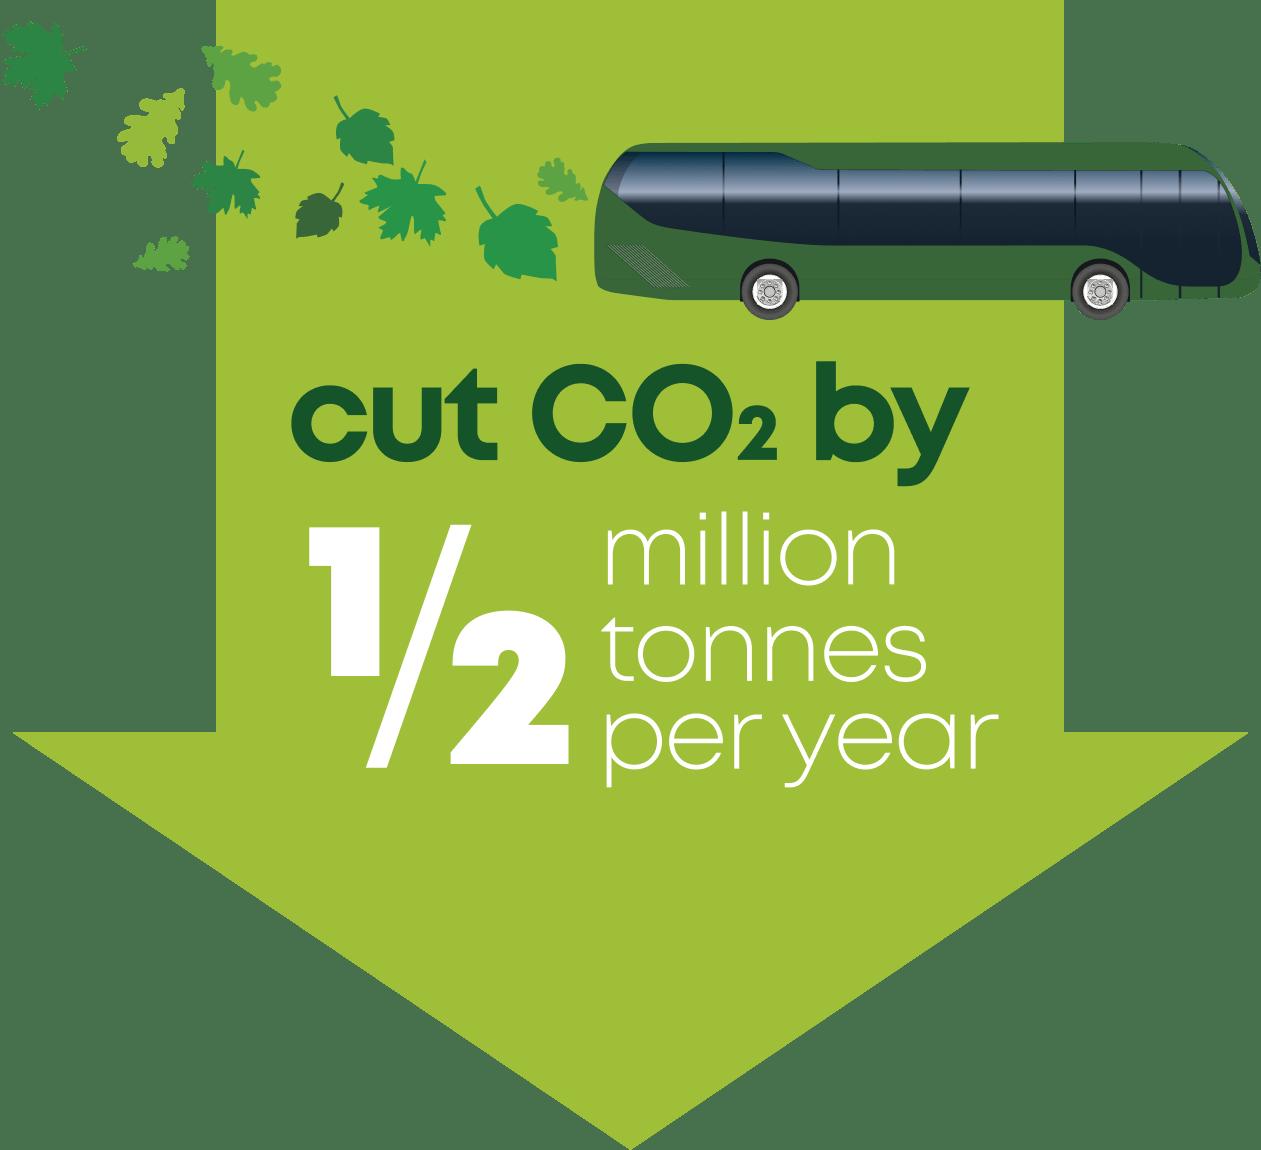 cut co2 by 1/2 million tonnes per year